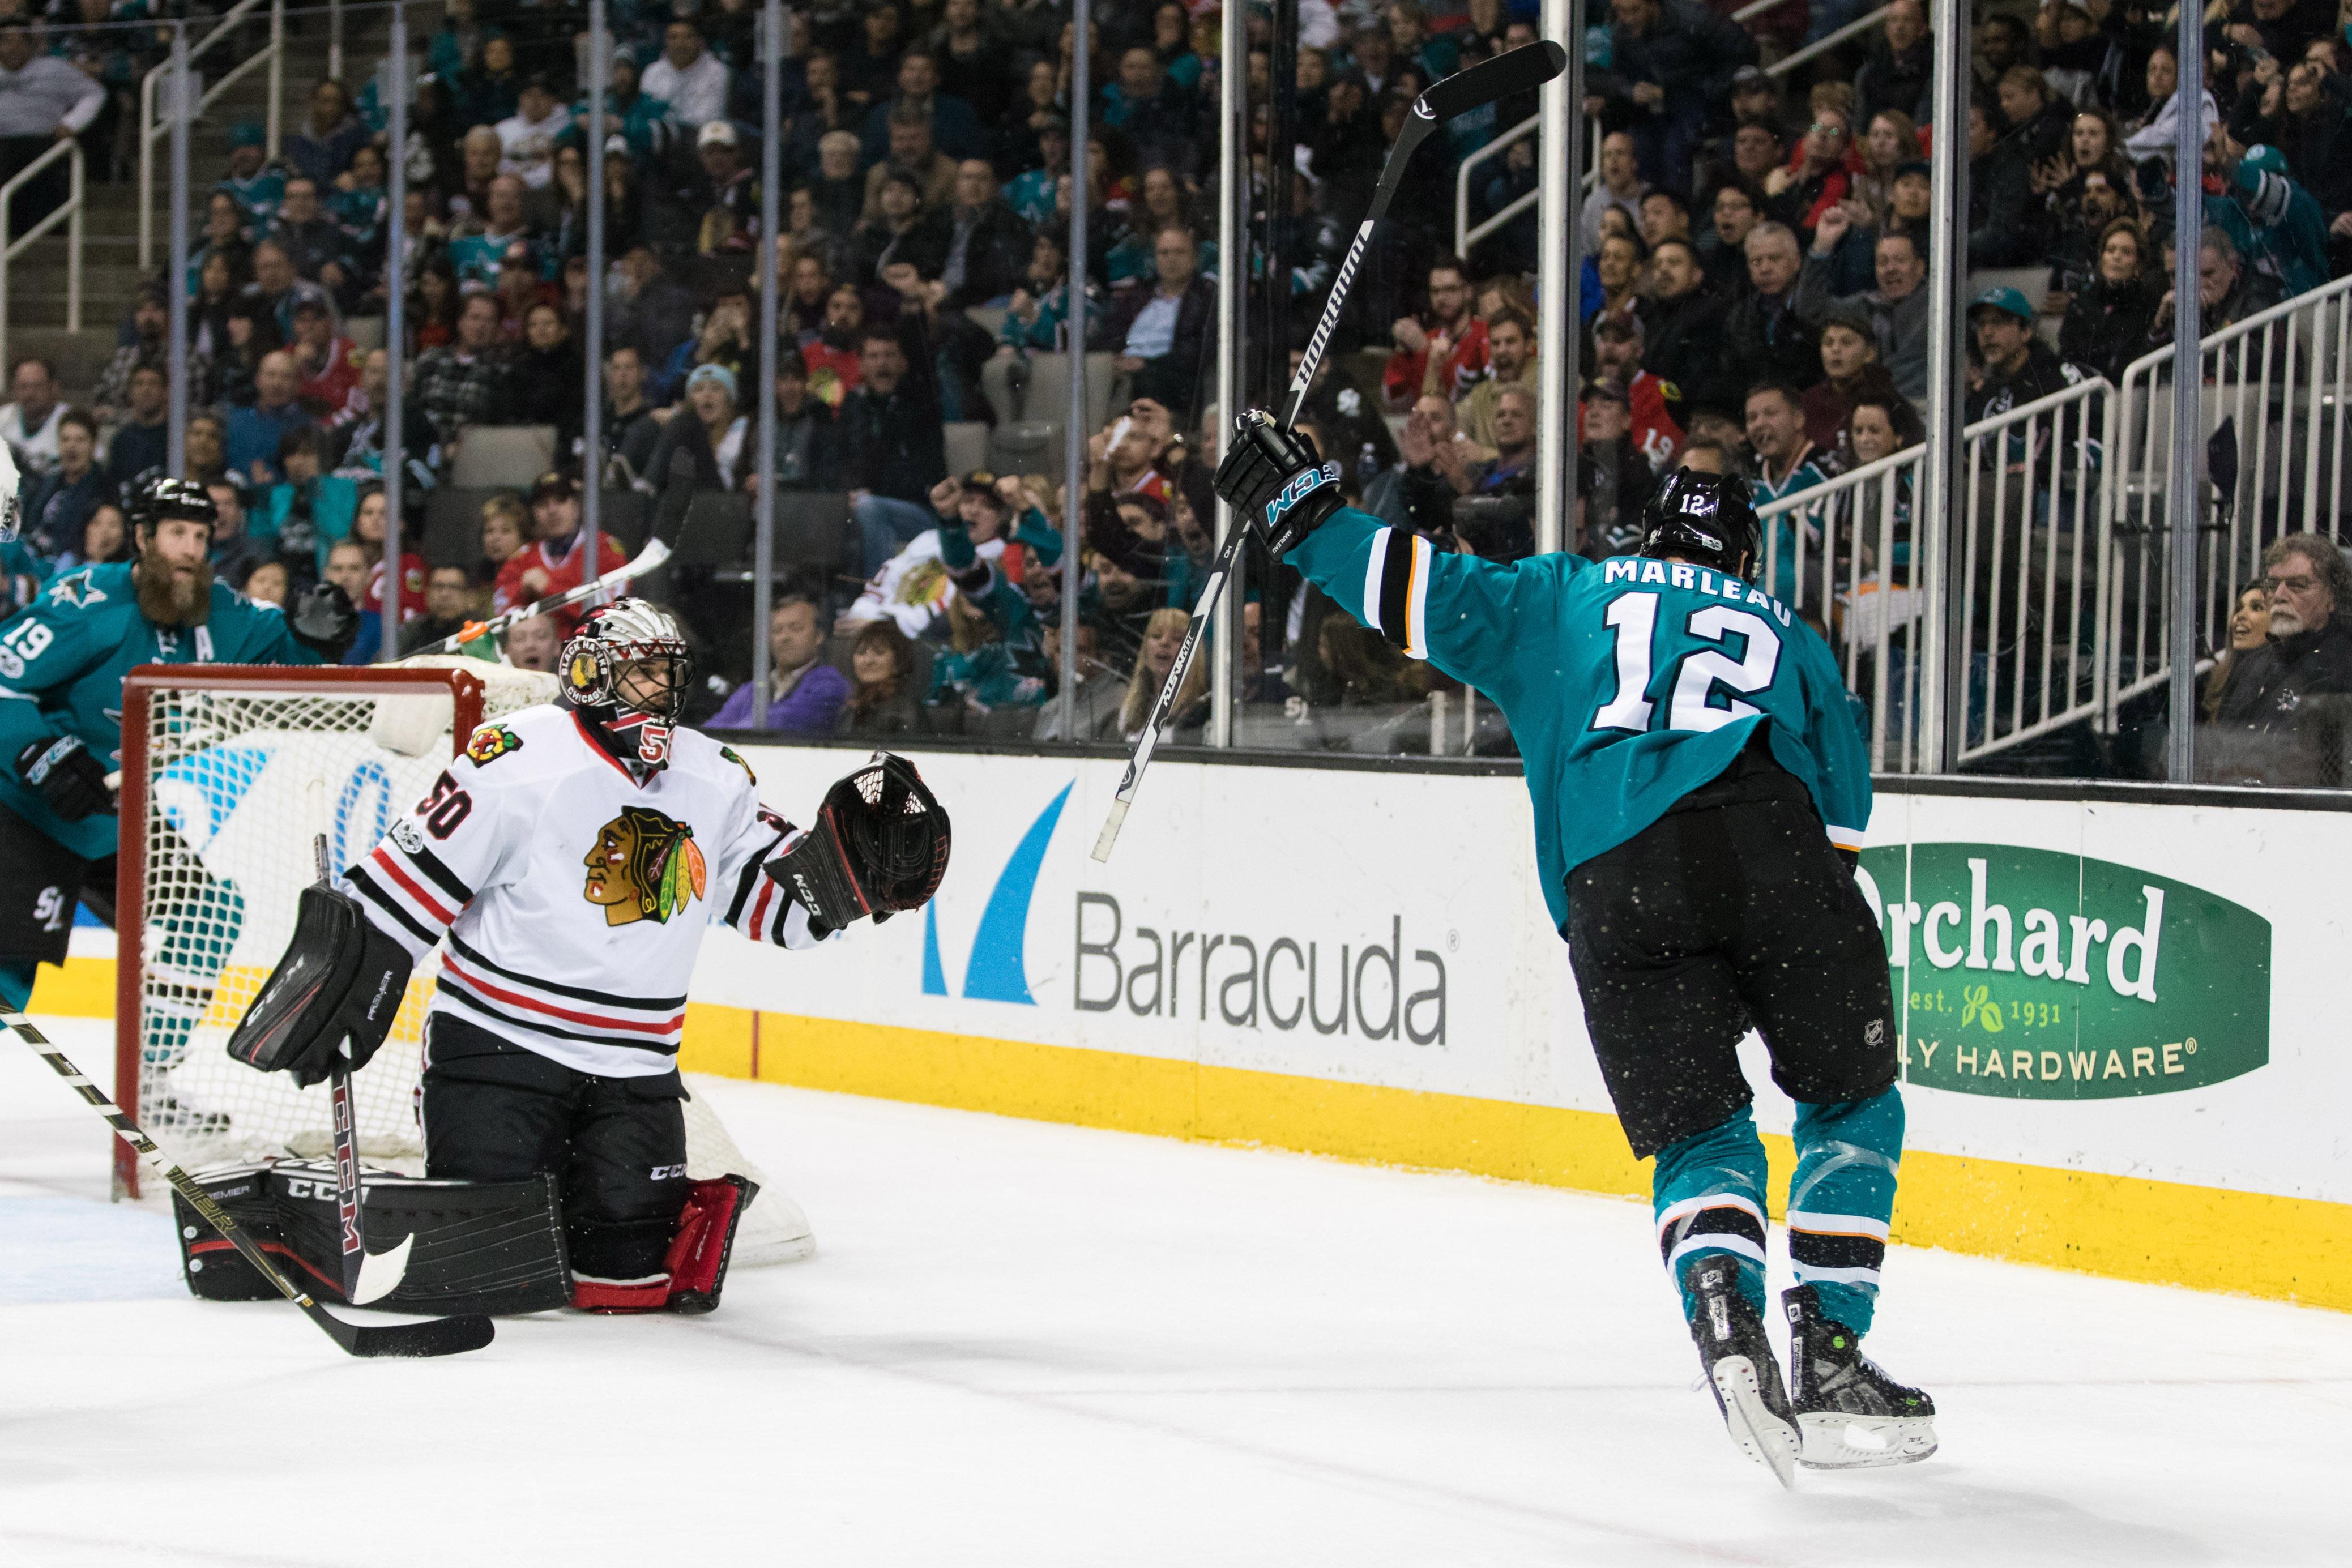 NHL: Chicago Blackhawks at San Jose Sharks